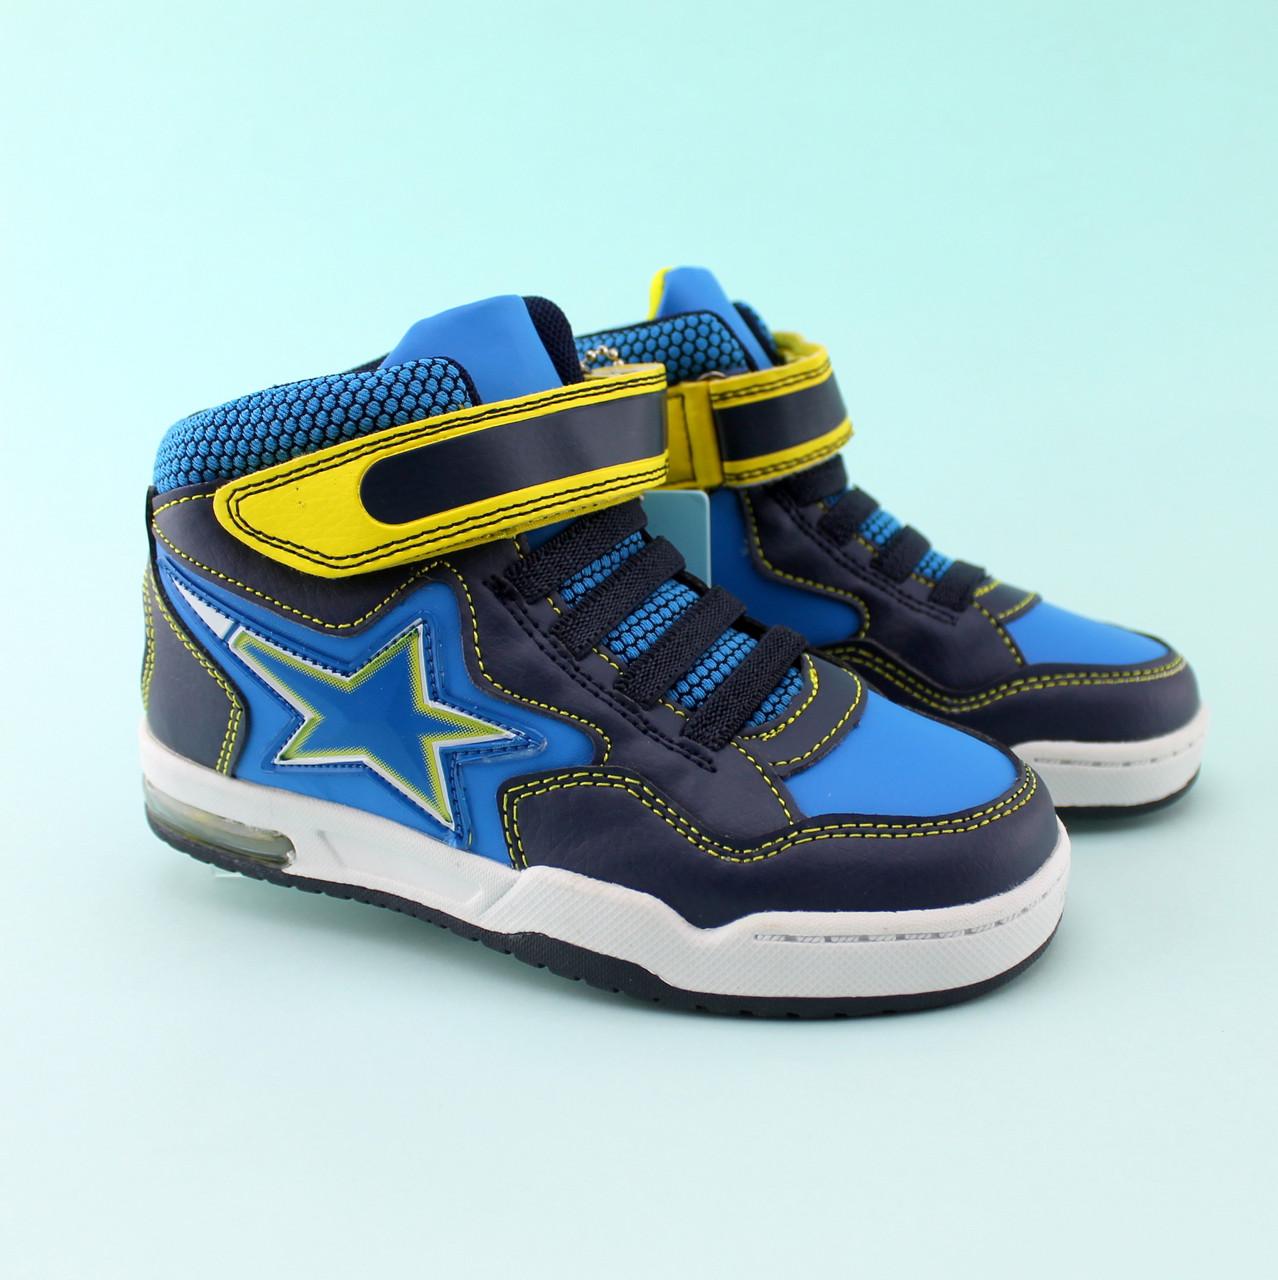 Ботинки на мальчика синие Звезды тм BiKi размер 29,30,31